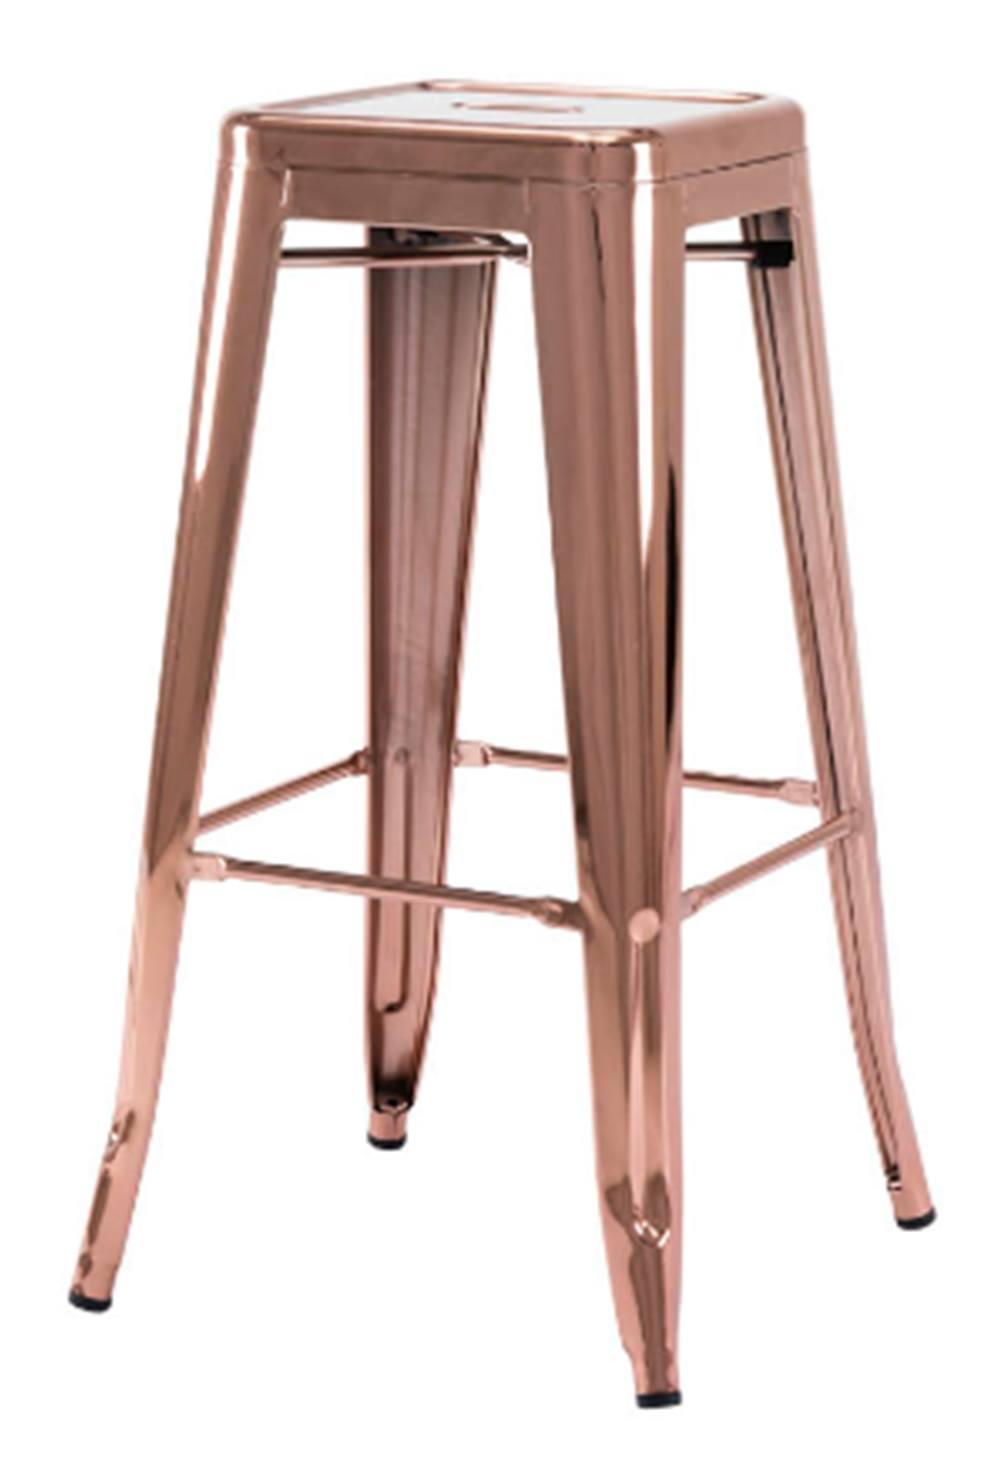 Banqueta Iron Alta Espelhada Cobre 76 cm (ALT) - 49947